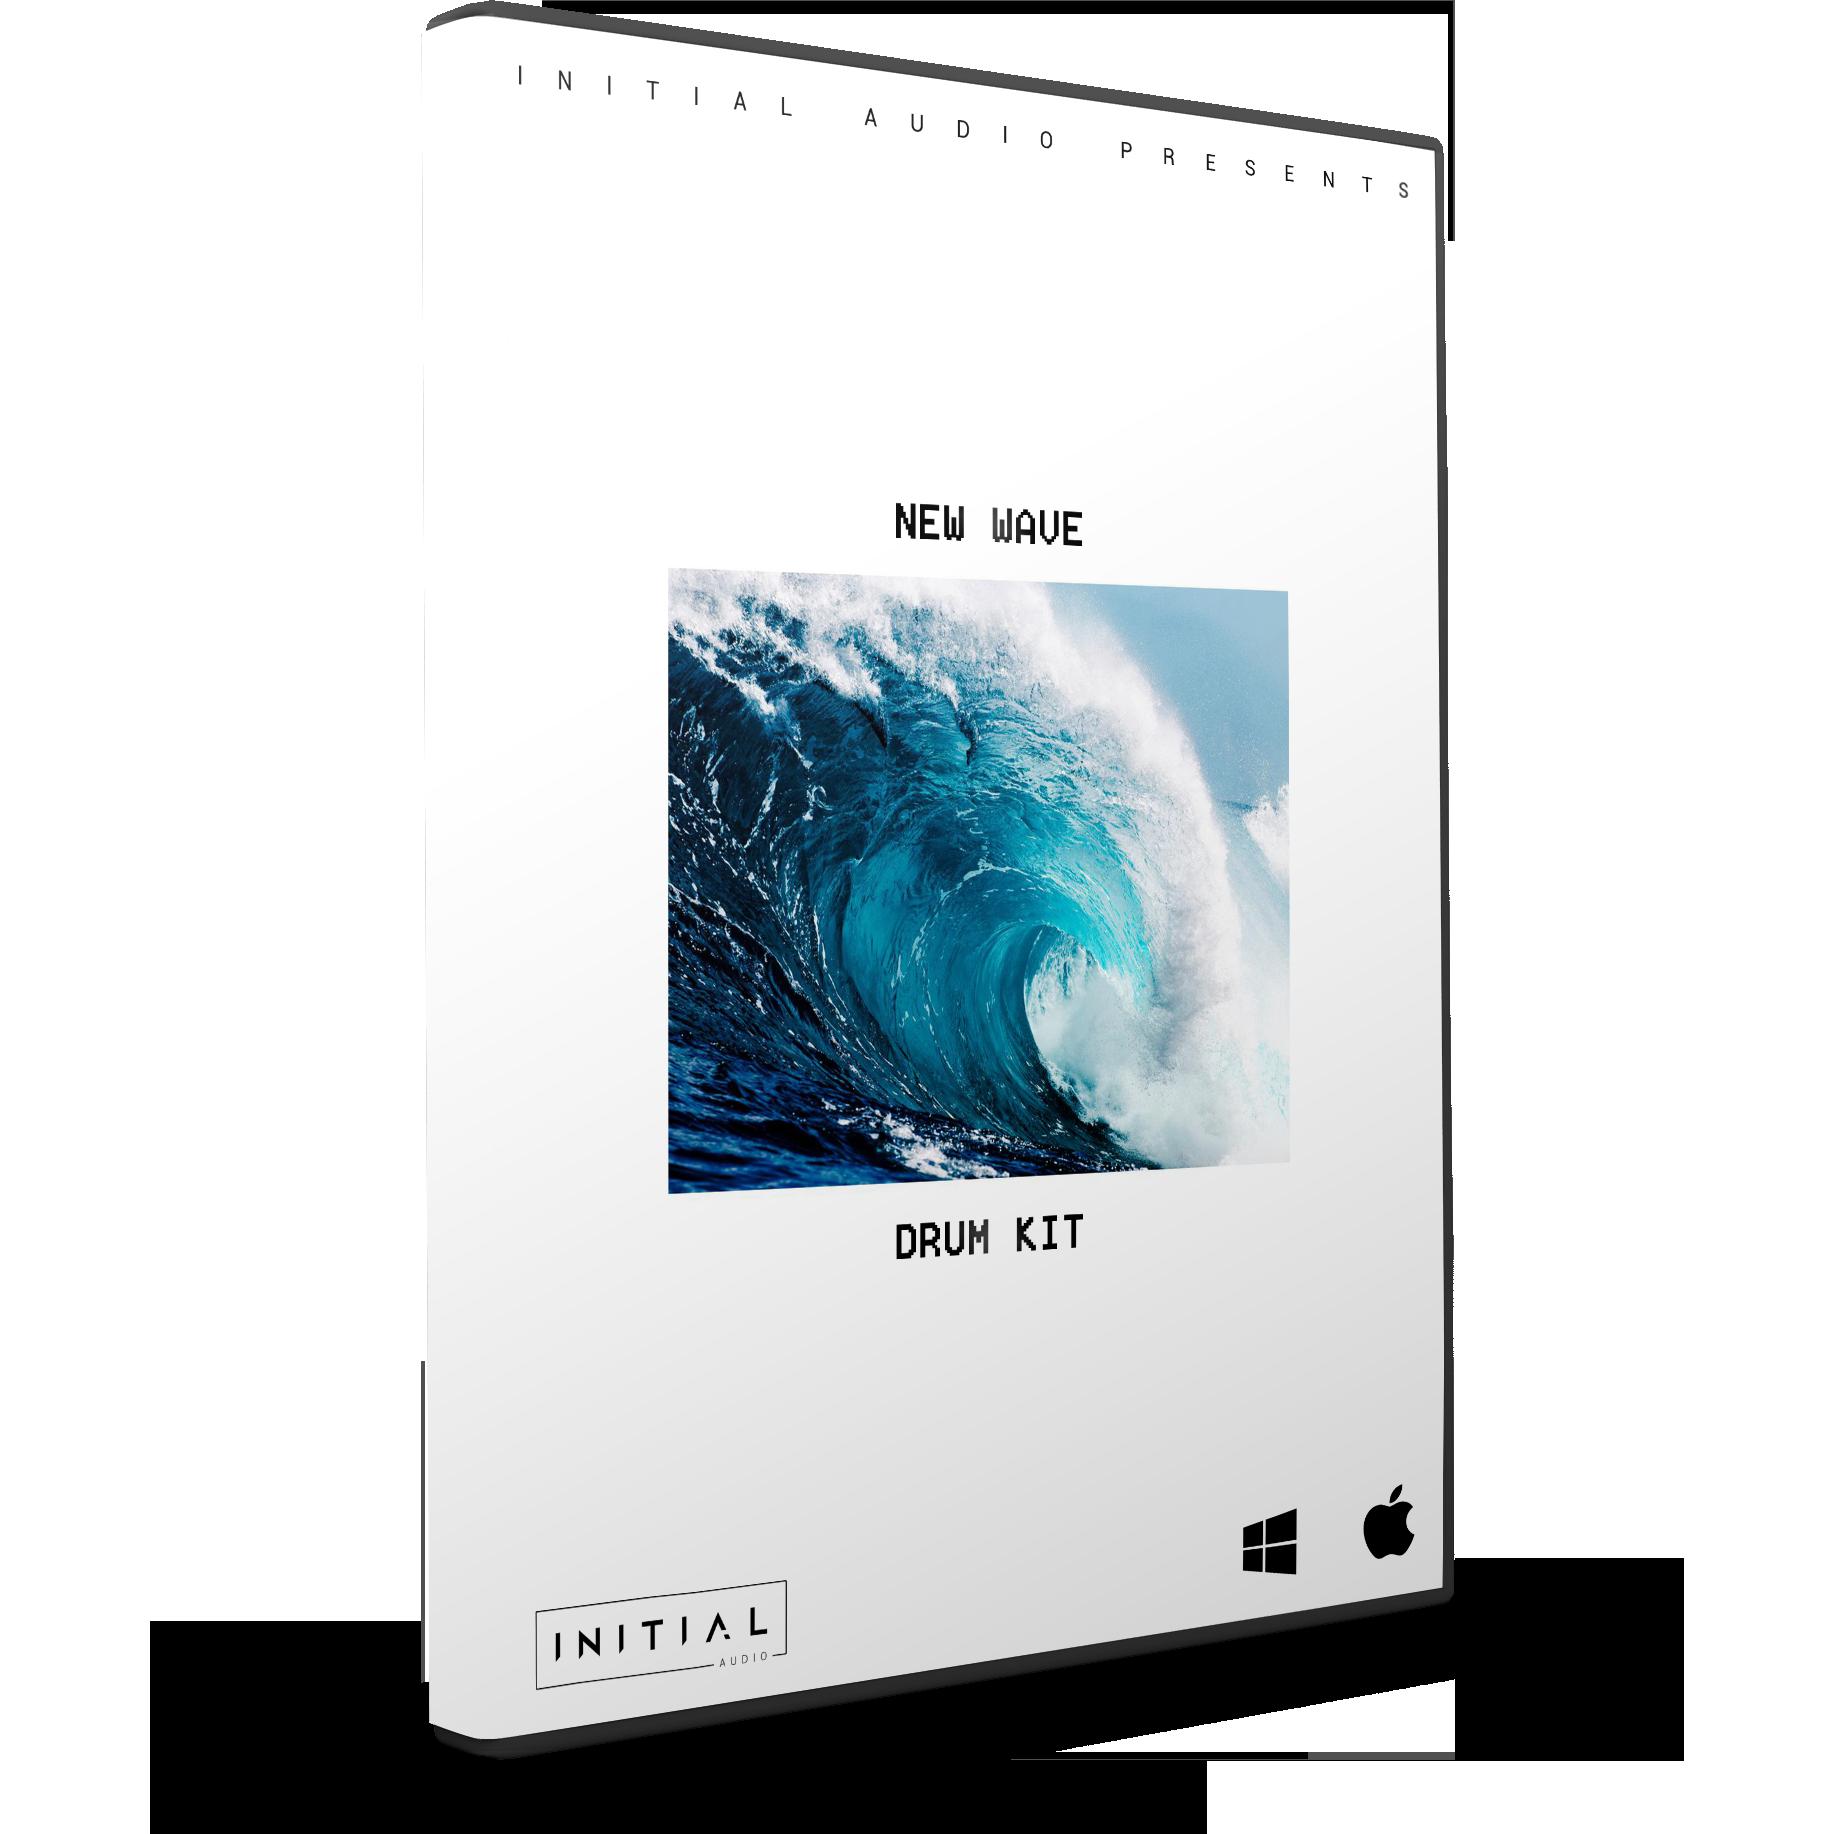 NEW WAVE - DRUM KIT